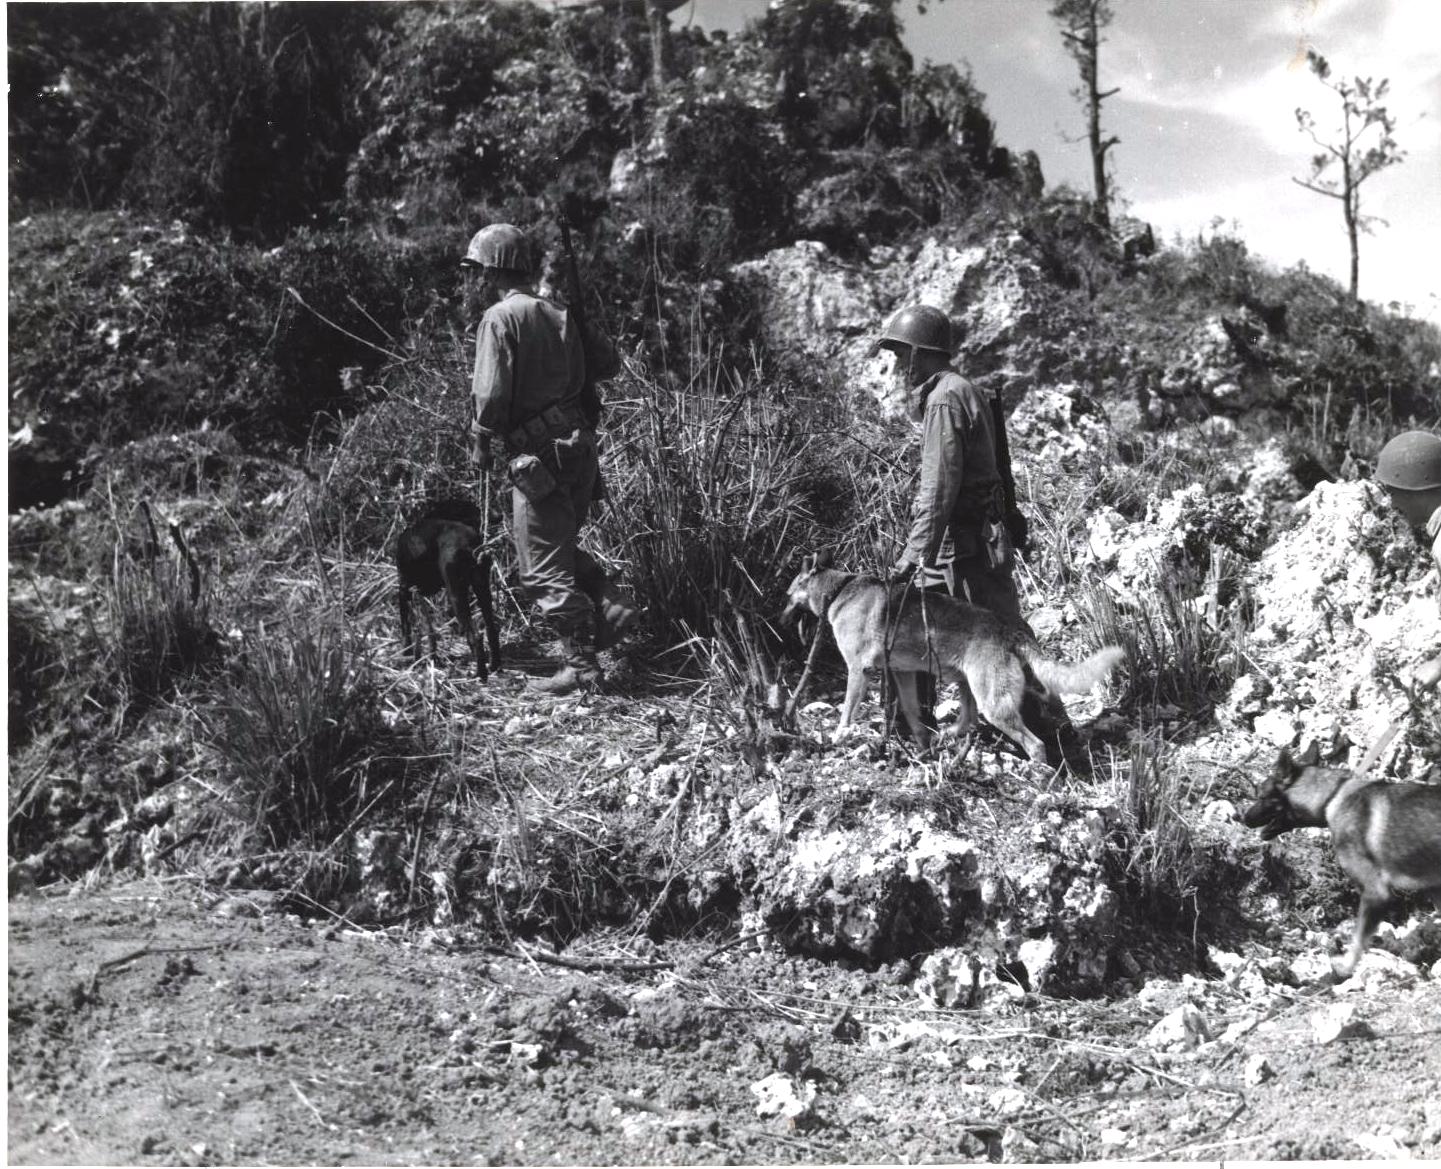 I War Dog americani pattugliano Okinawa